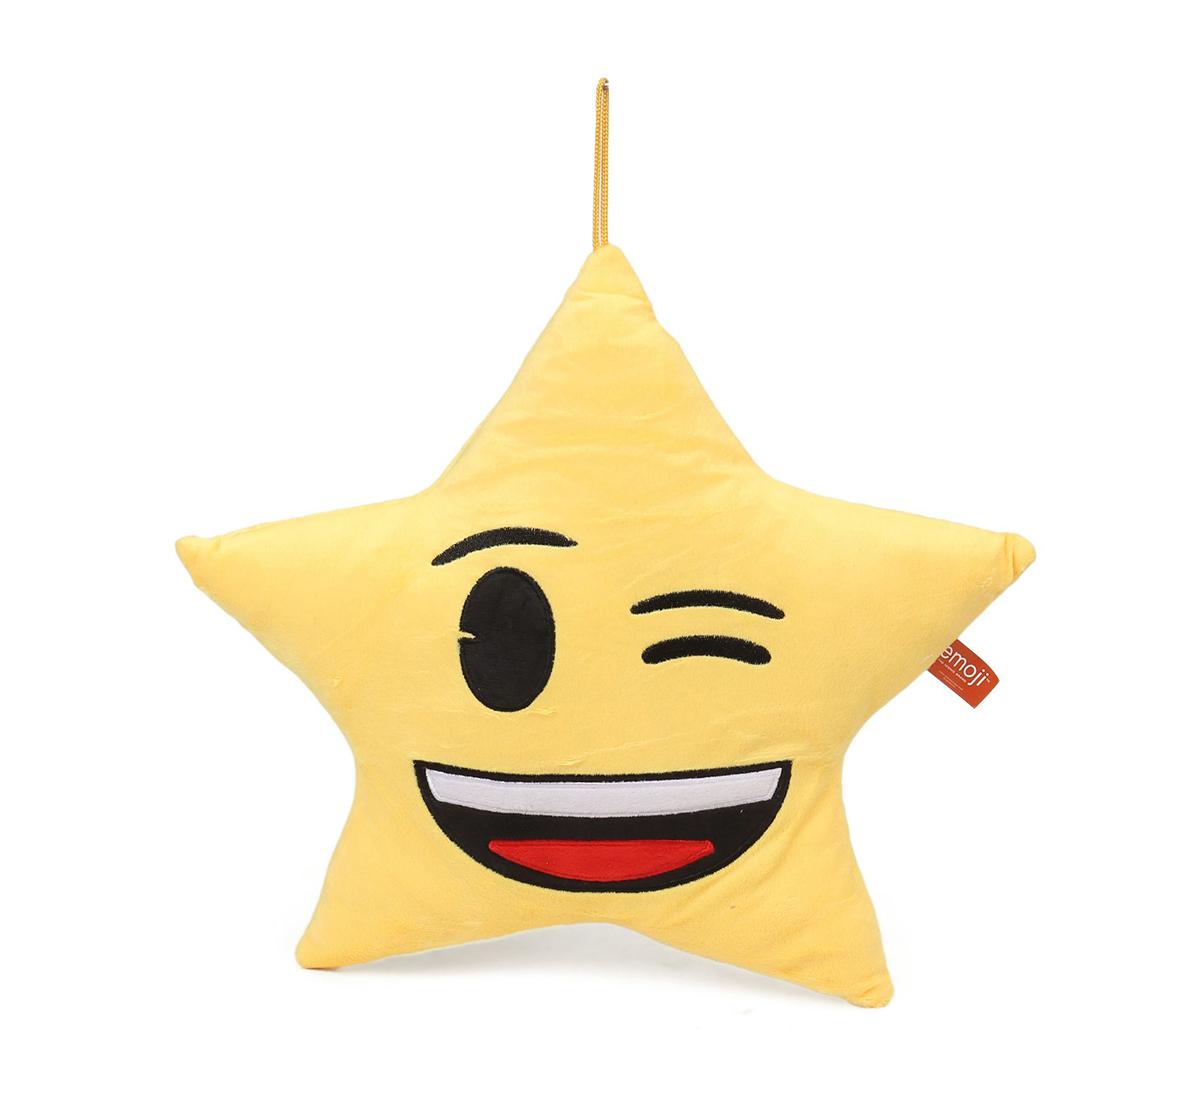 Emoji |  My Baby Excel Emoji Star Winking Eyes Face 30 Cm Plush Accessory for Kids age 1Y+  (Yellow)